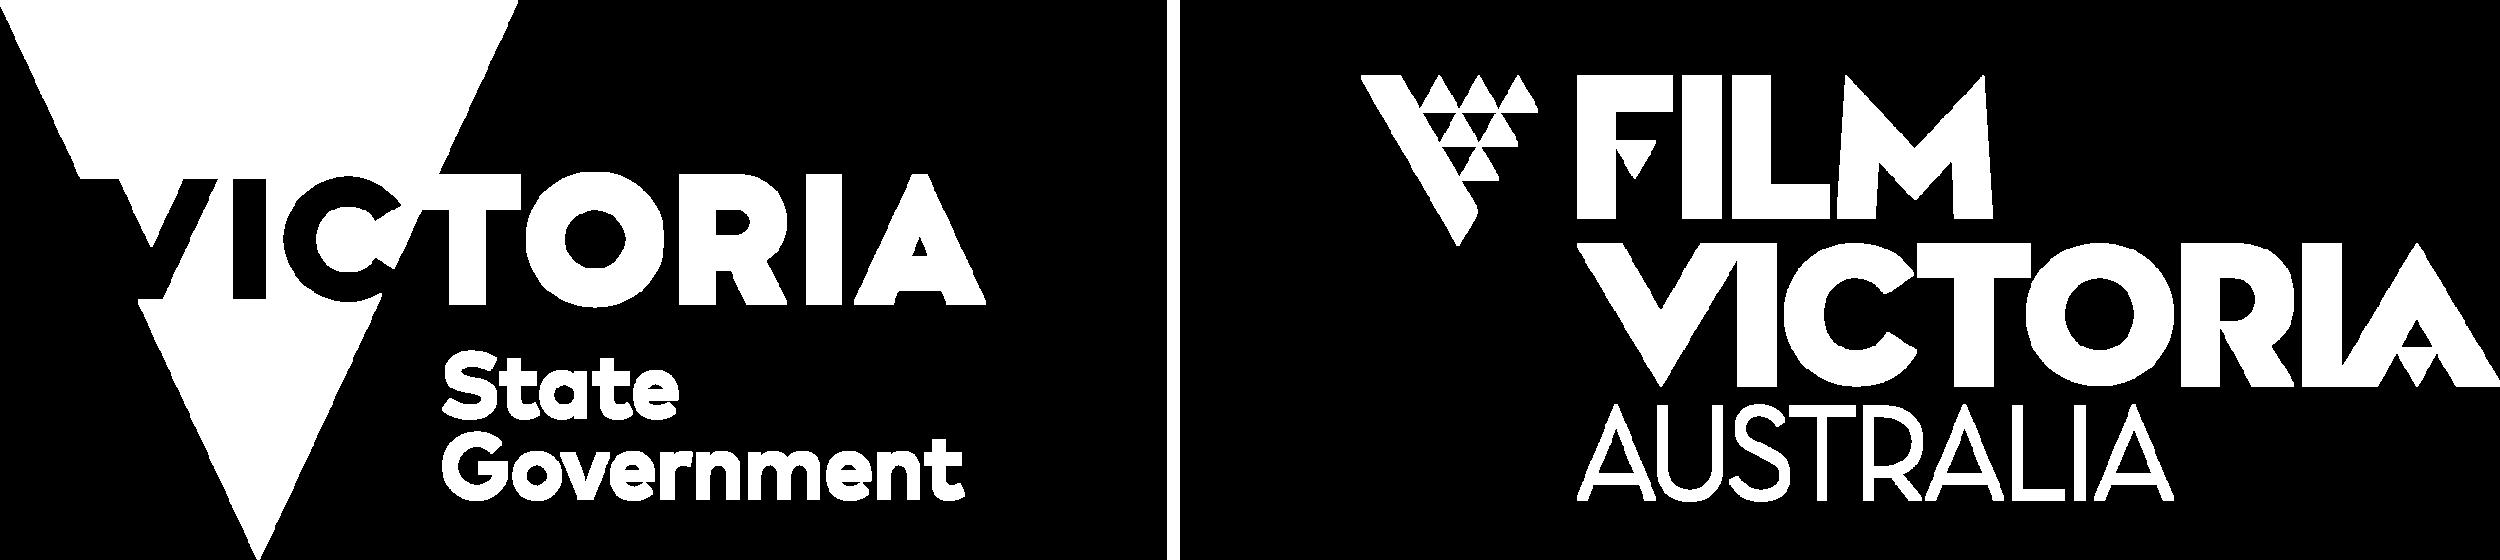 Film_Victoria_State_Gov_logo_reverse.png